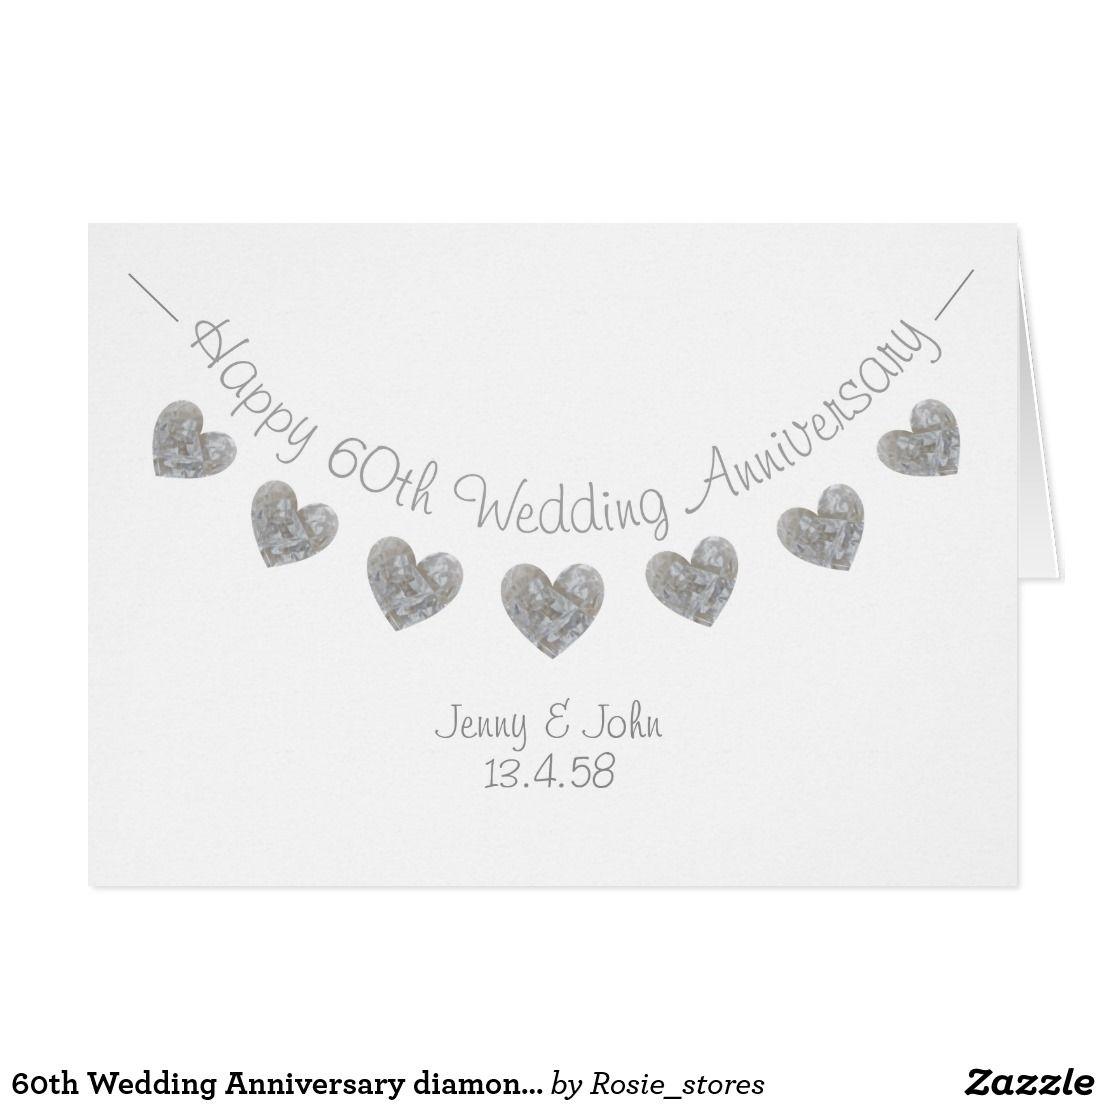 60th Wedding Anniversary diamond hearts card | Zazzle.co.uk